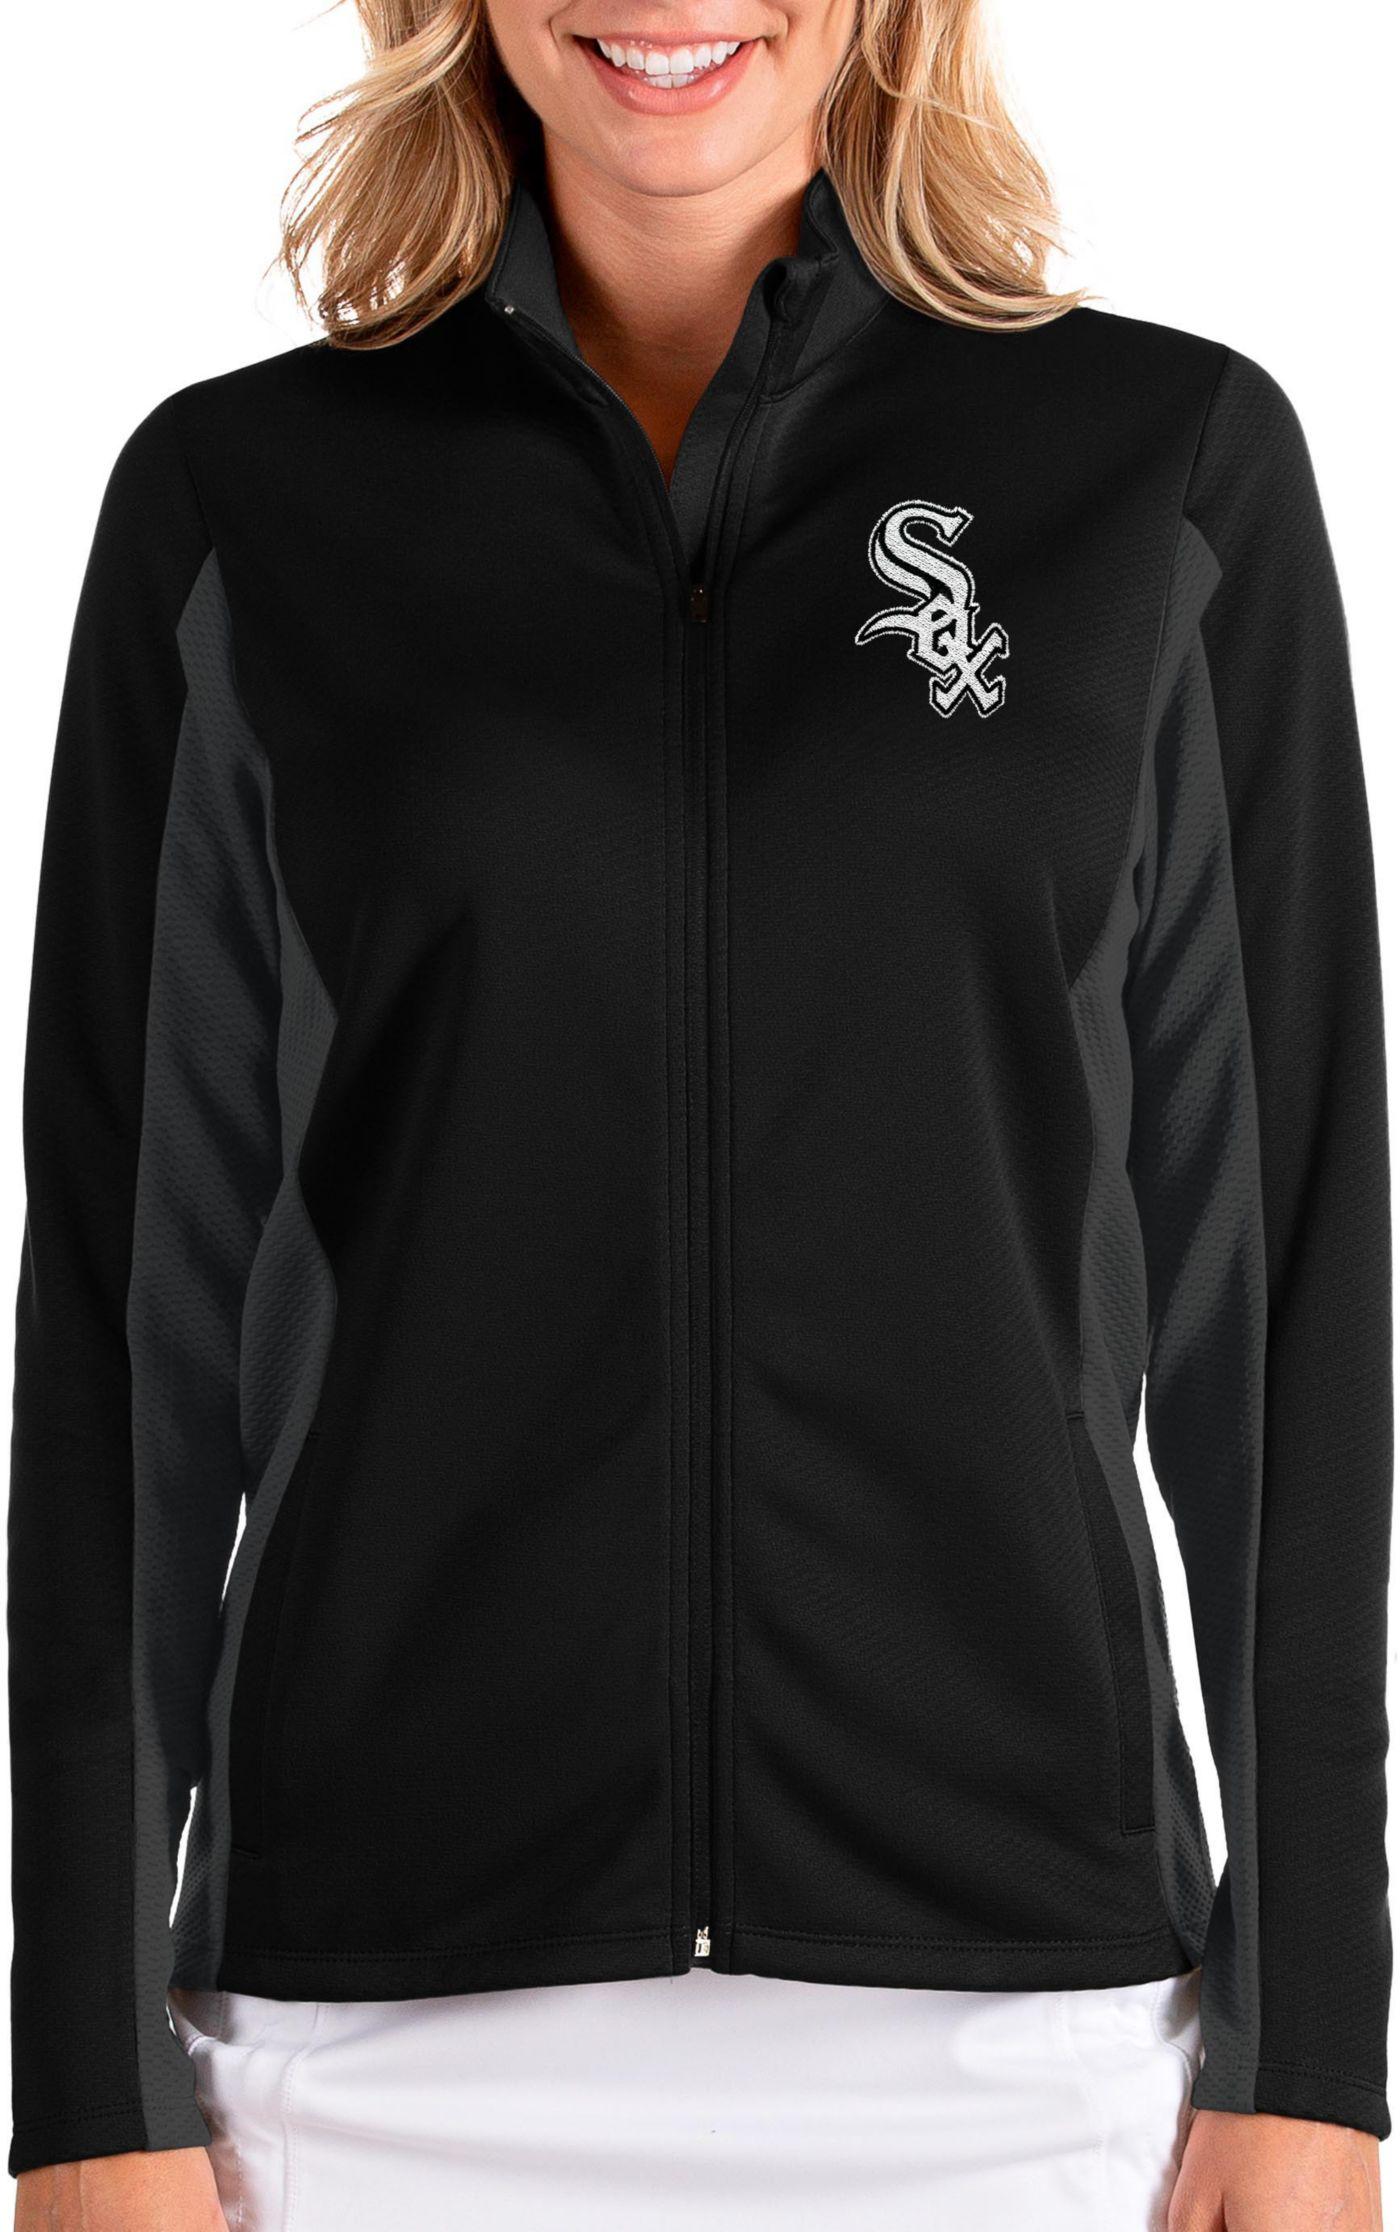 Antigua Women's Chicago White Sox Black Passage Full-Zip Jacket